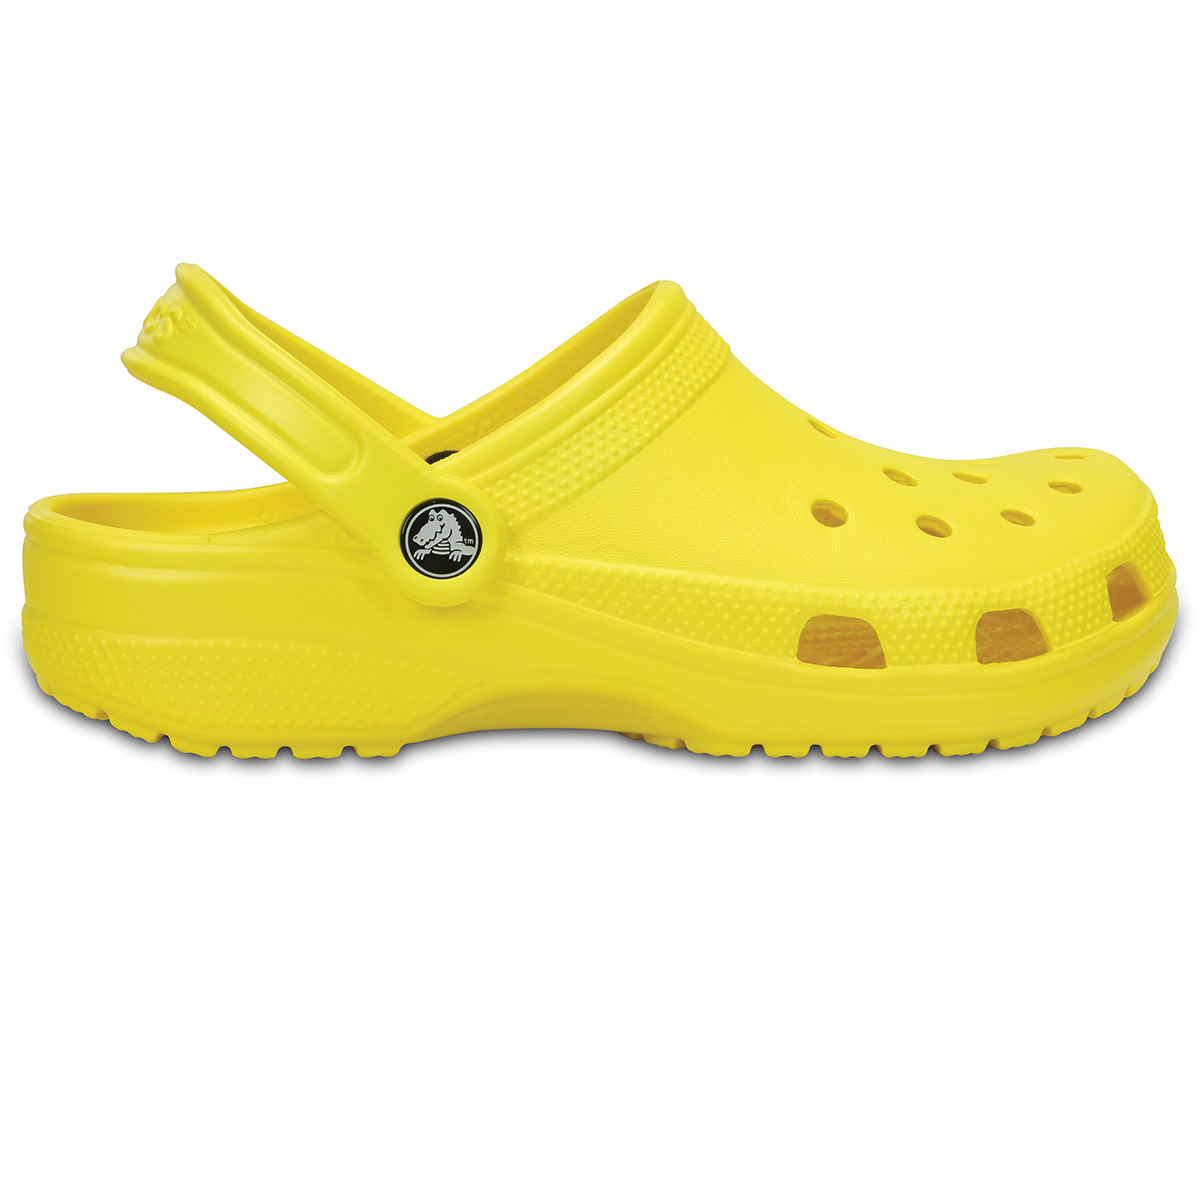 Crocs Classic - Limon